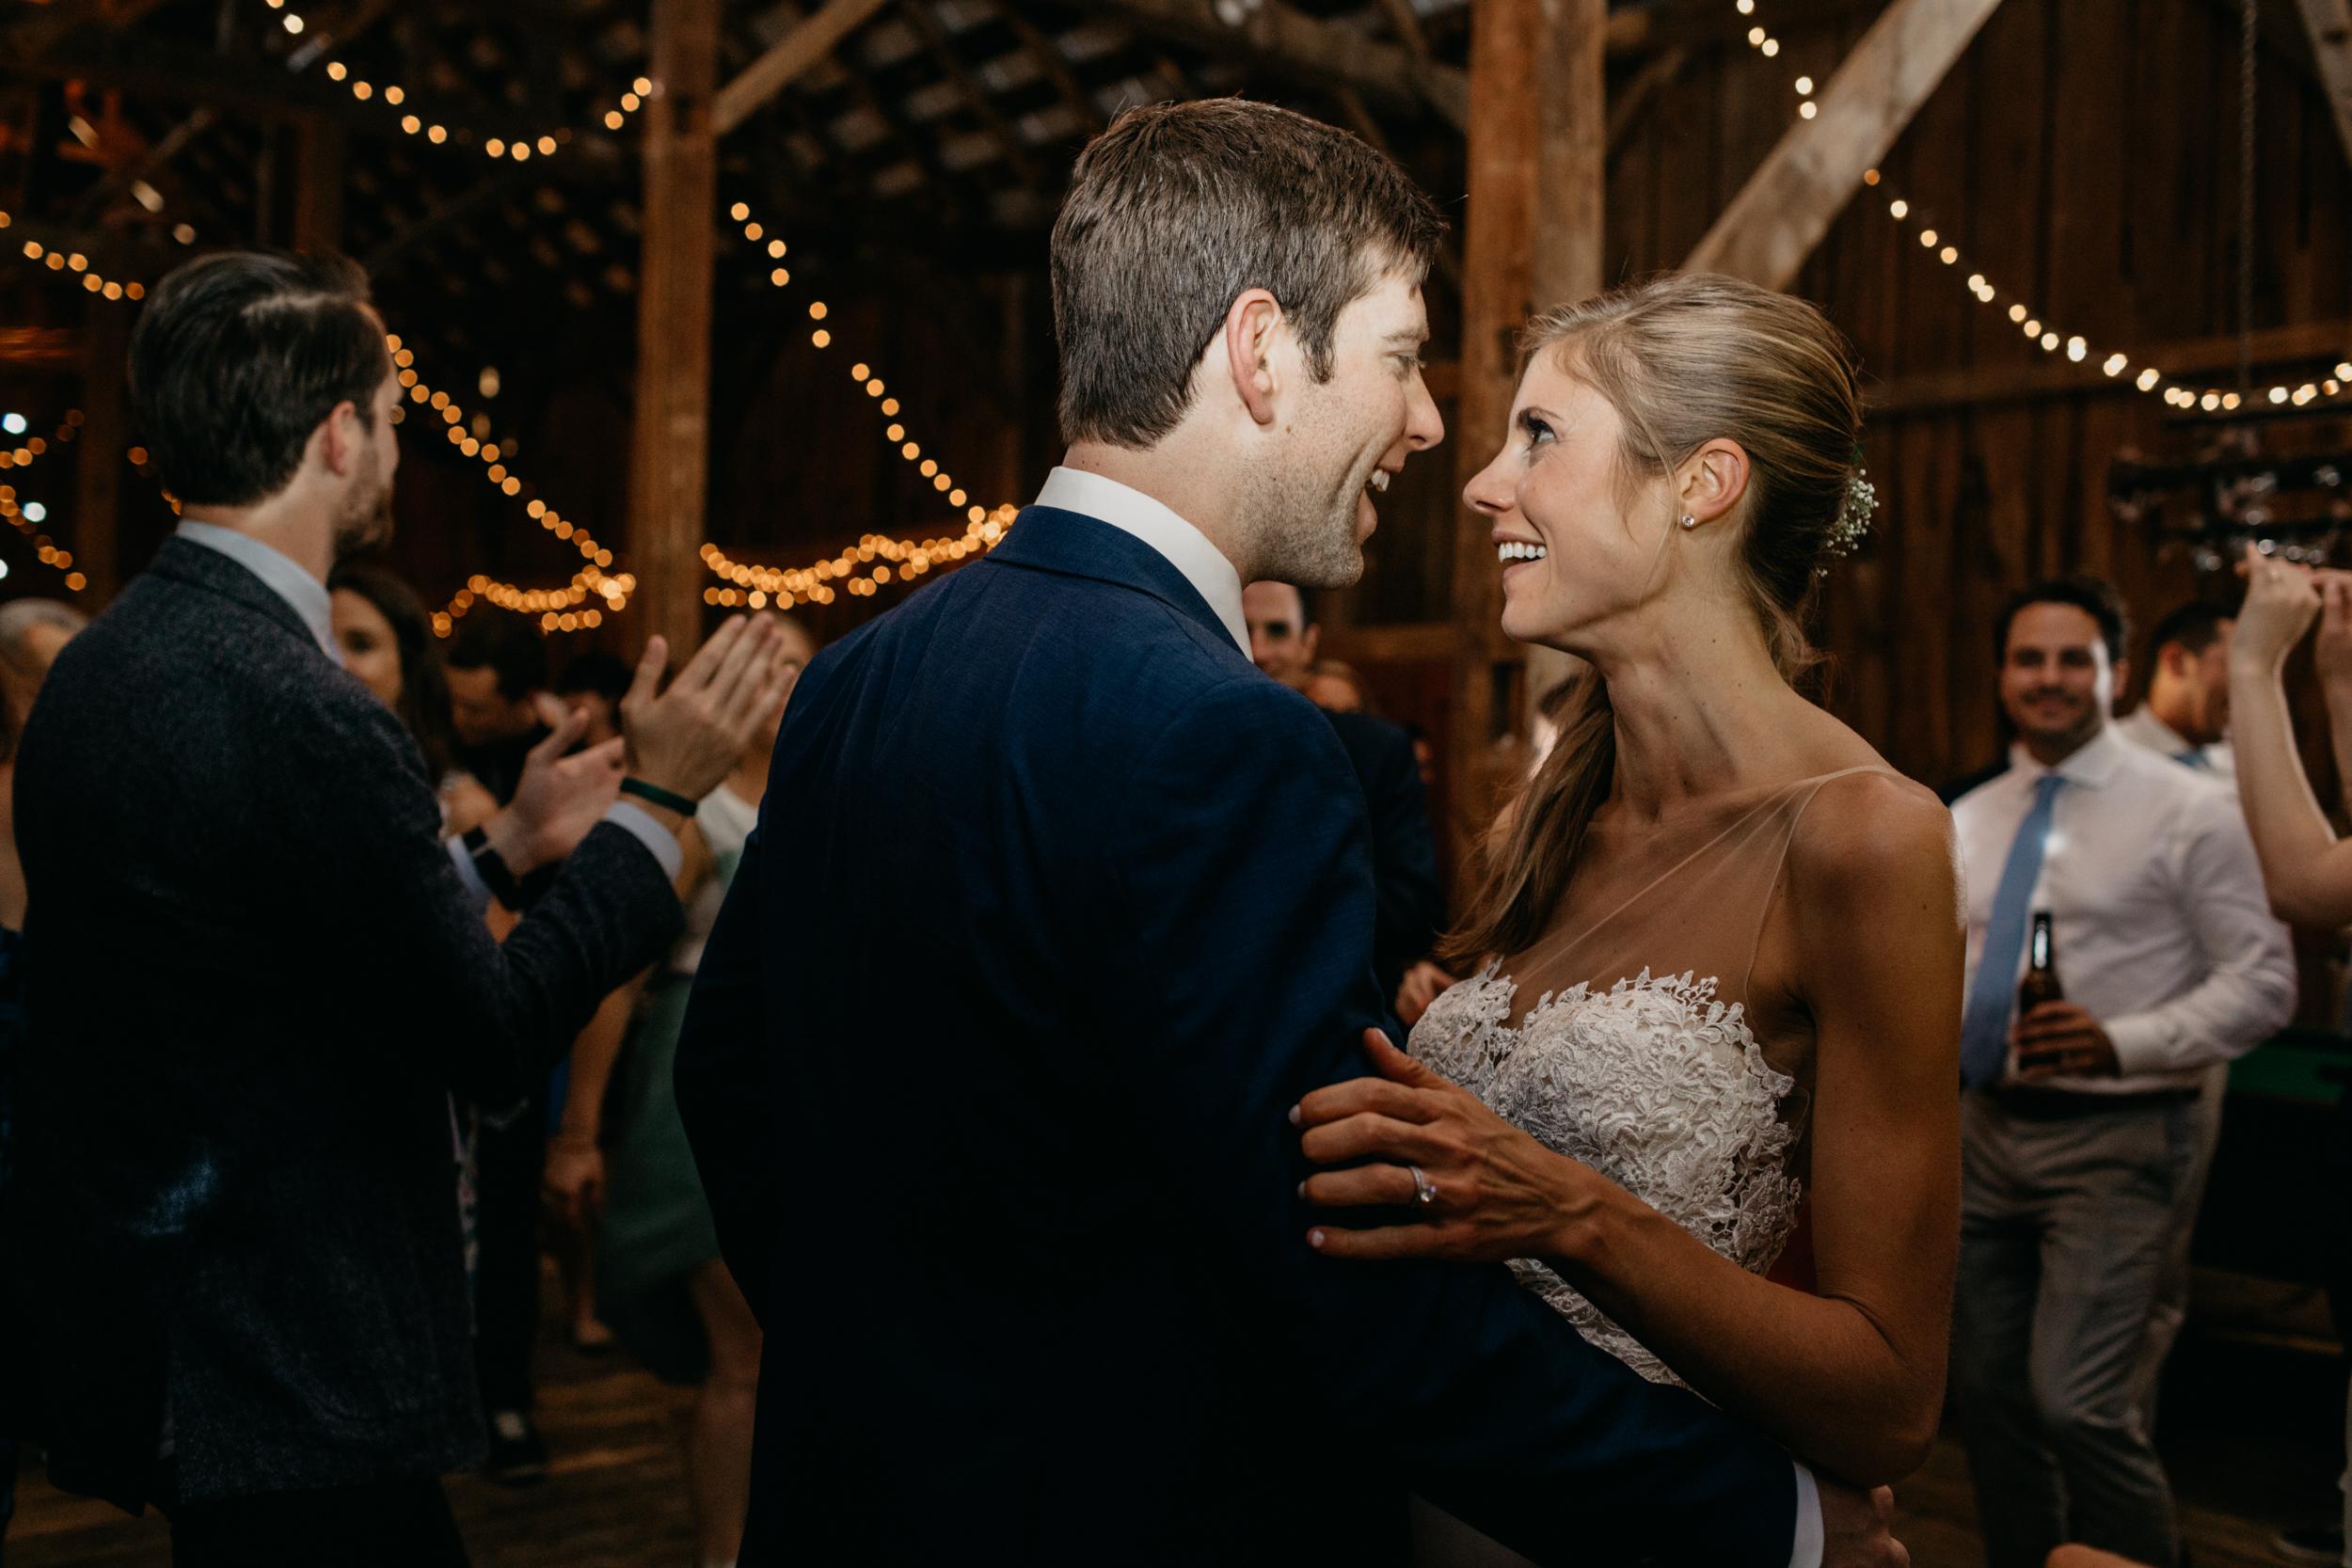 Karen_Alex_Bliss_ridge_farm_Vermont_wedding030.jpg